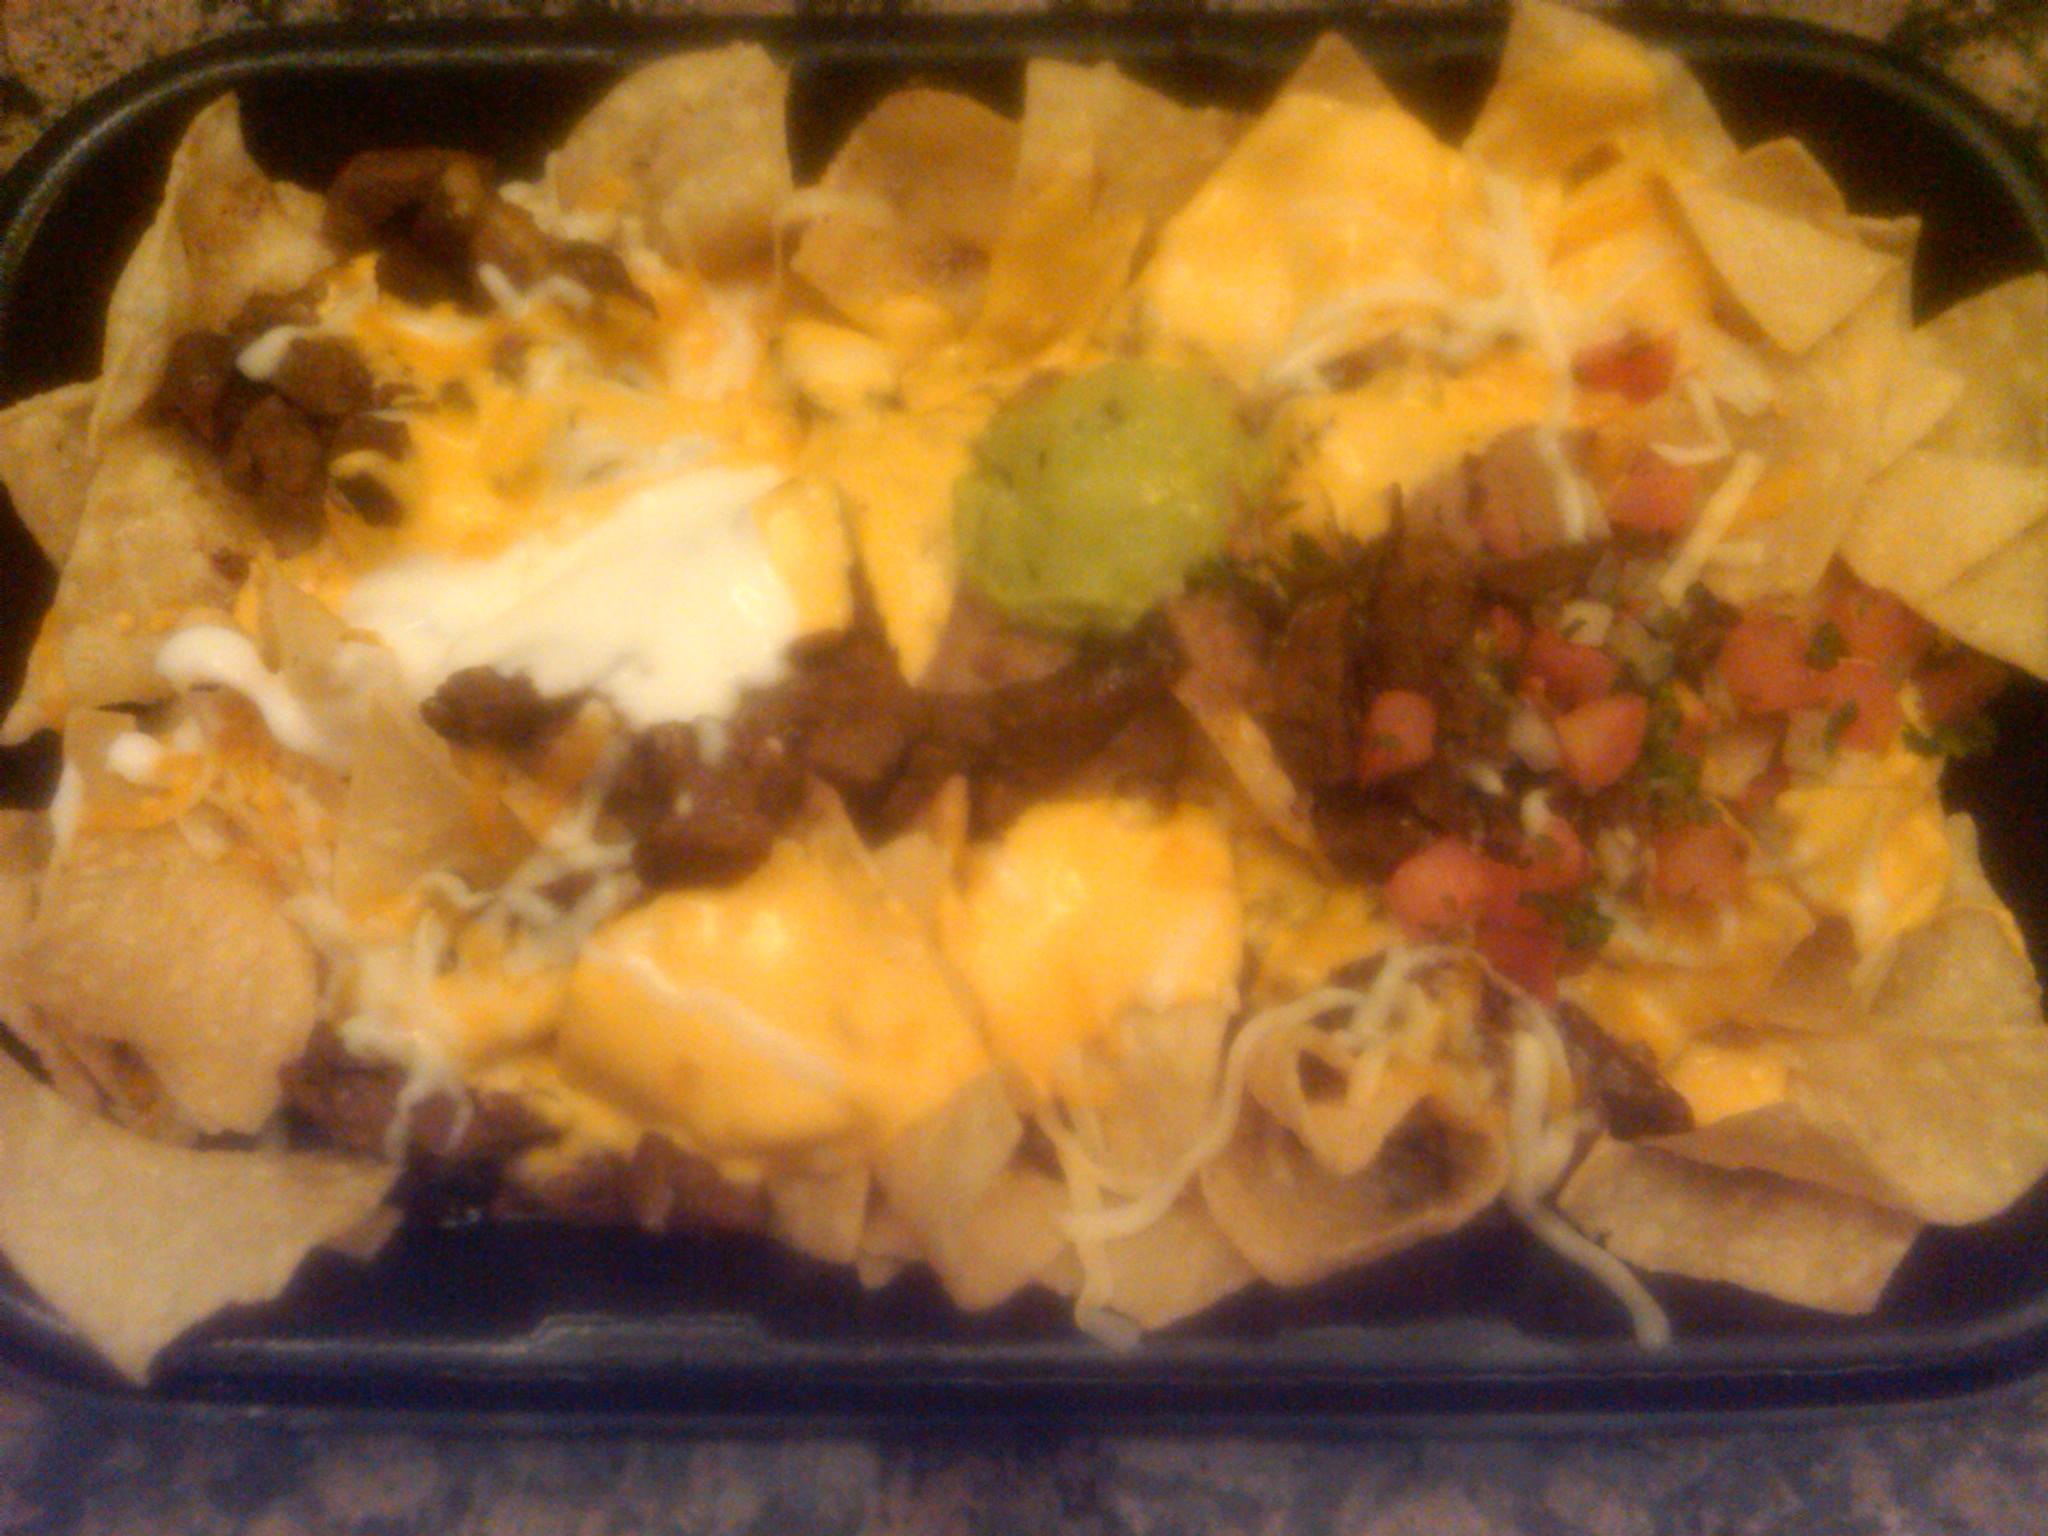 Taco Bell Breakfast Pics